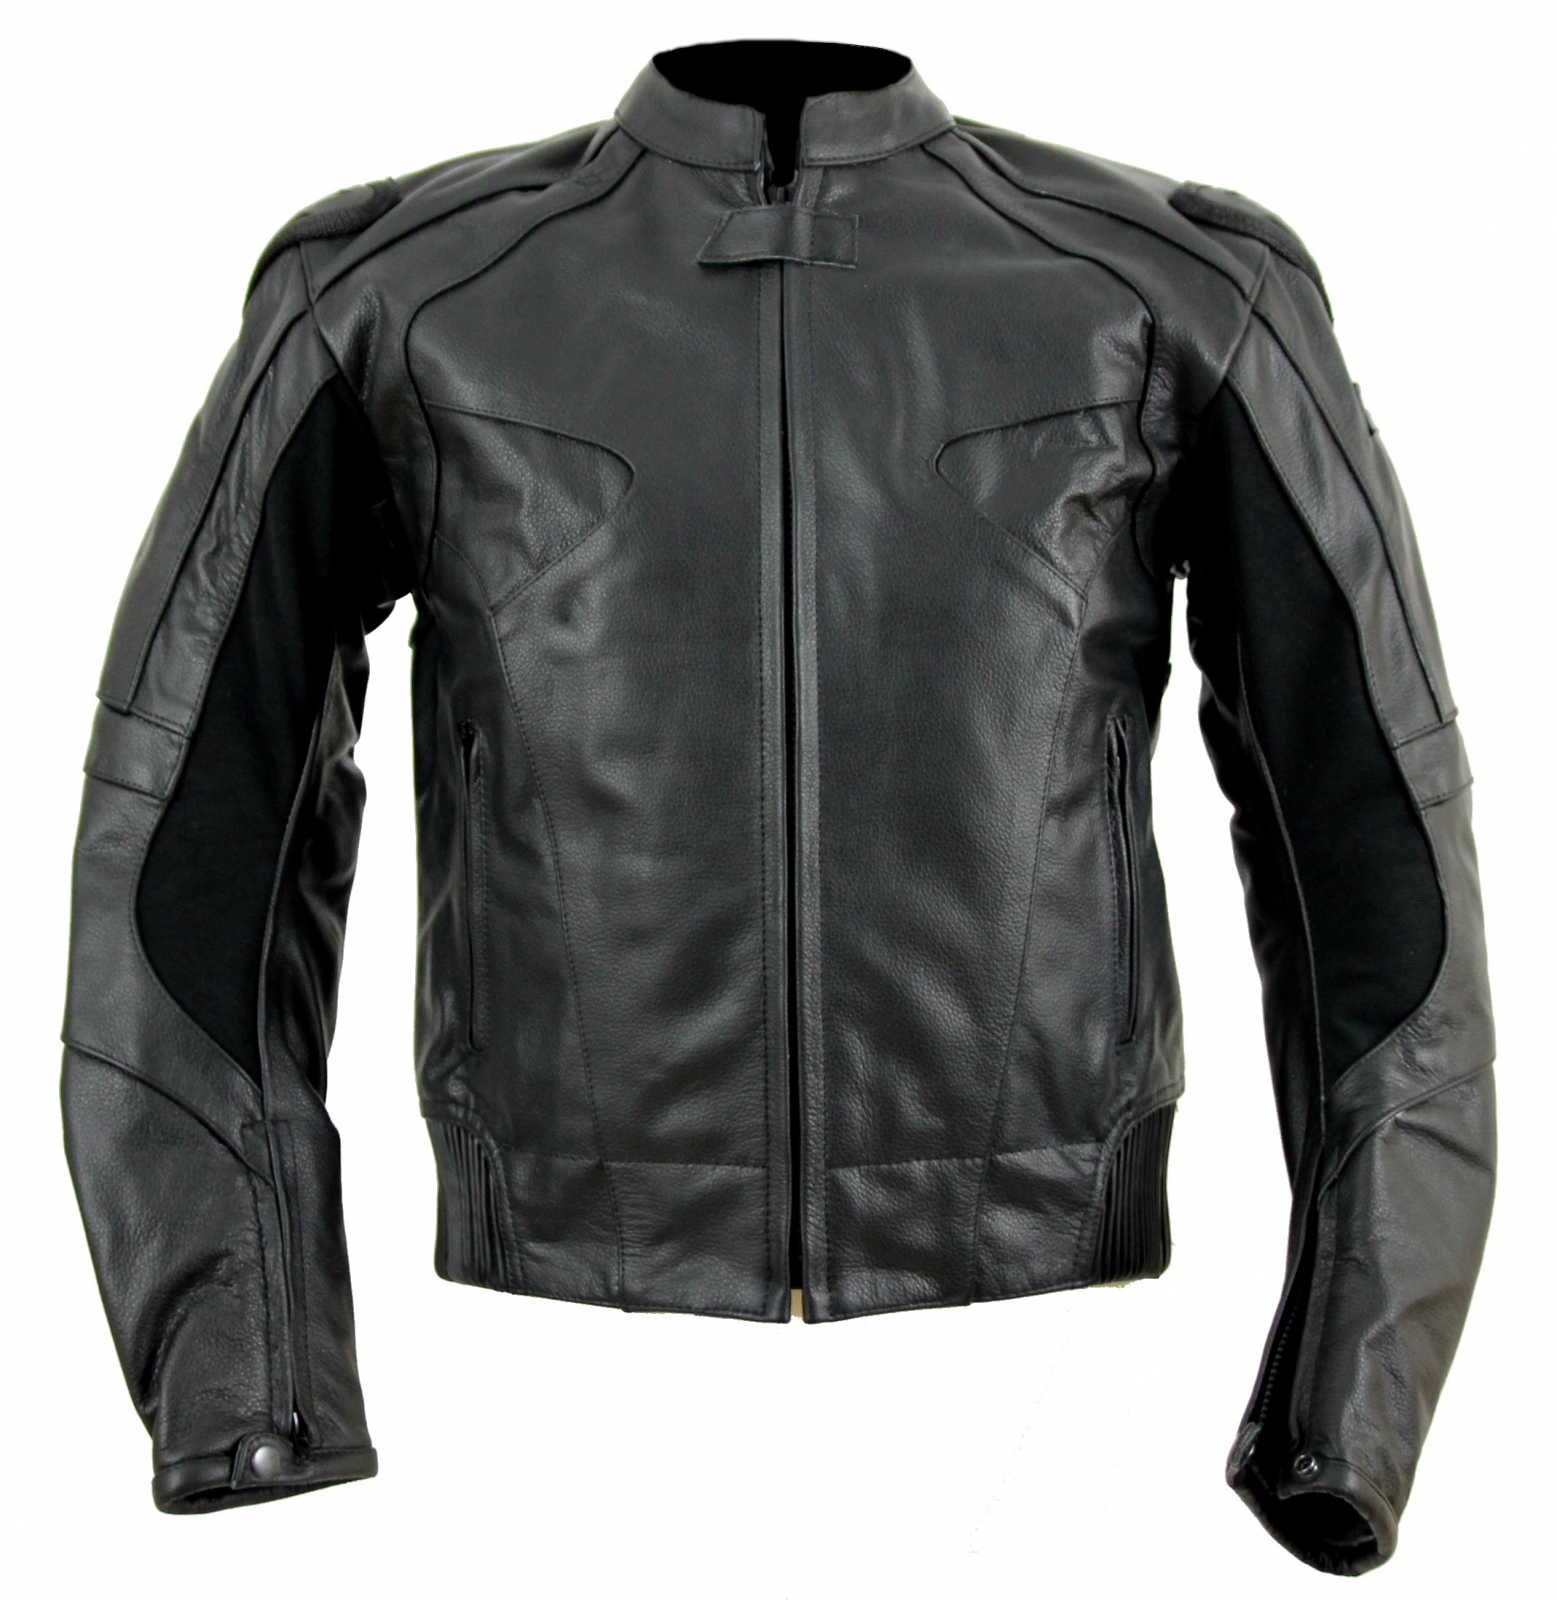 kc013 blouson cuir moto vintage noir karno motorsport blouson veste blouson veste moto. Black Bedroom Furniture Sets. Home Design Ideas